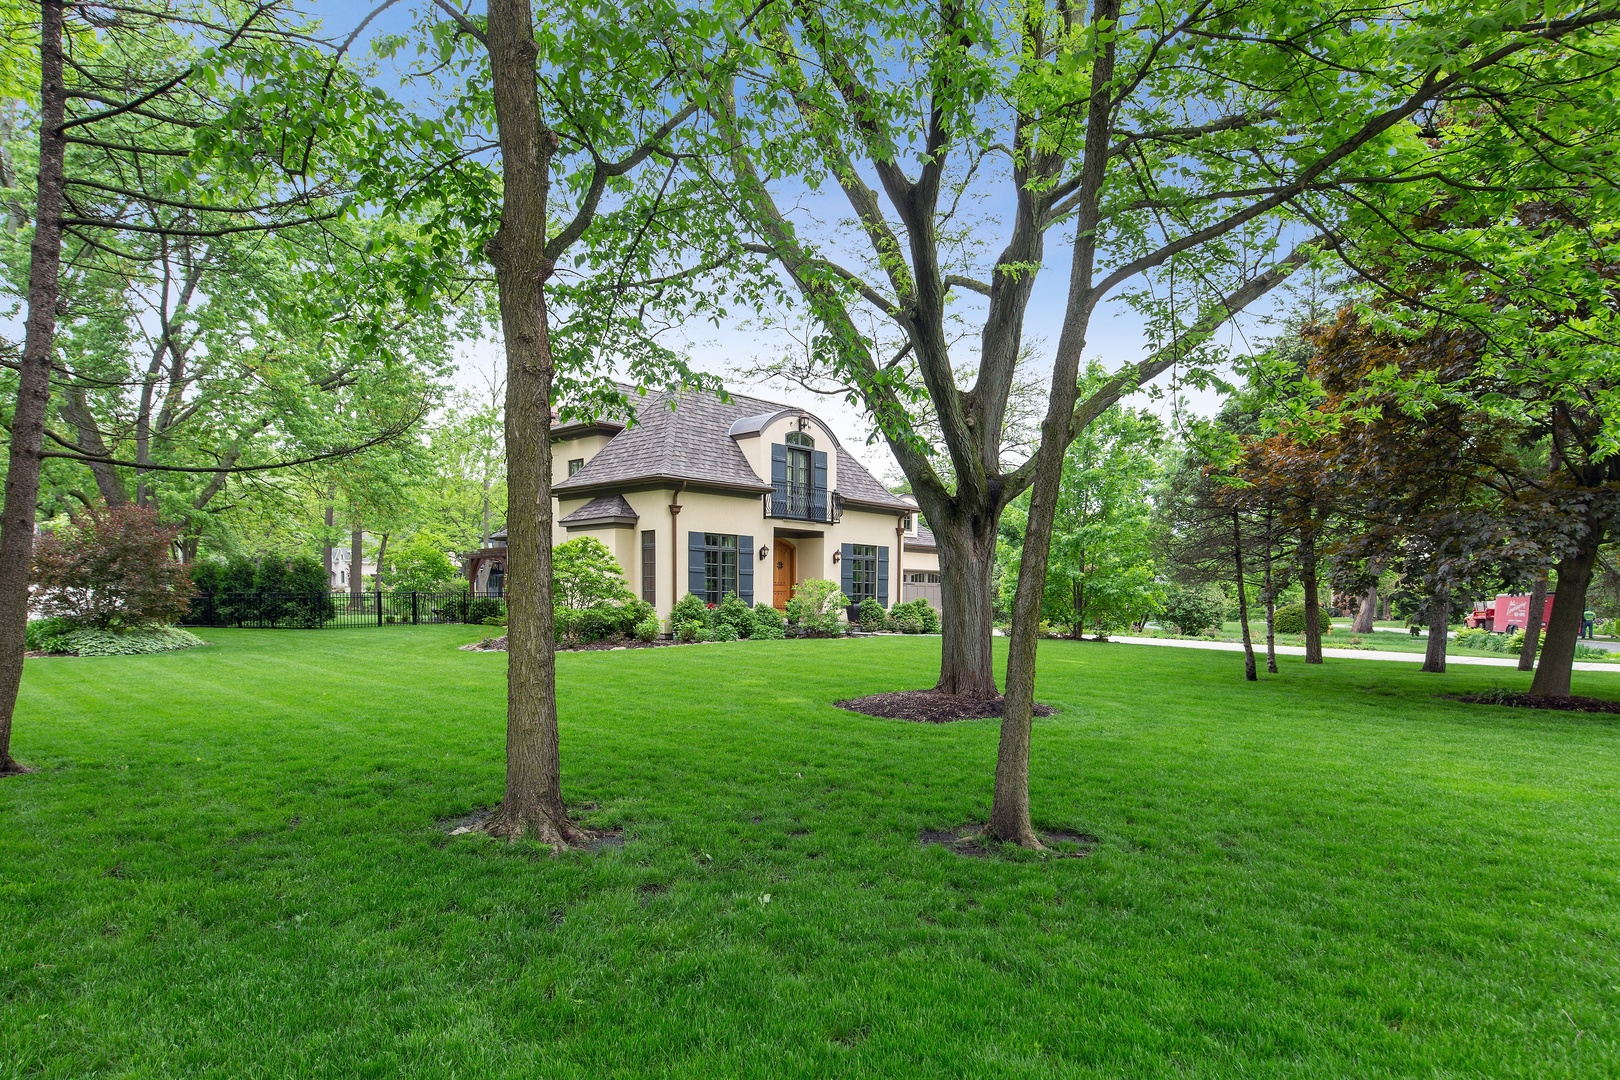 755 East 7th, Hinsdale, Illinois, 60521